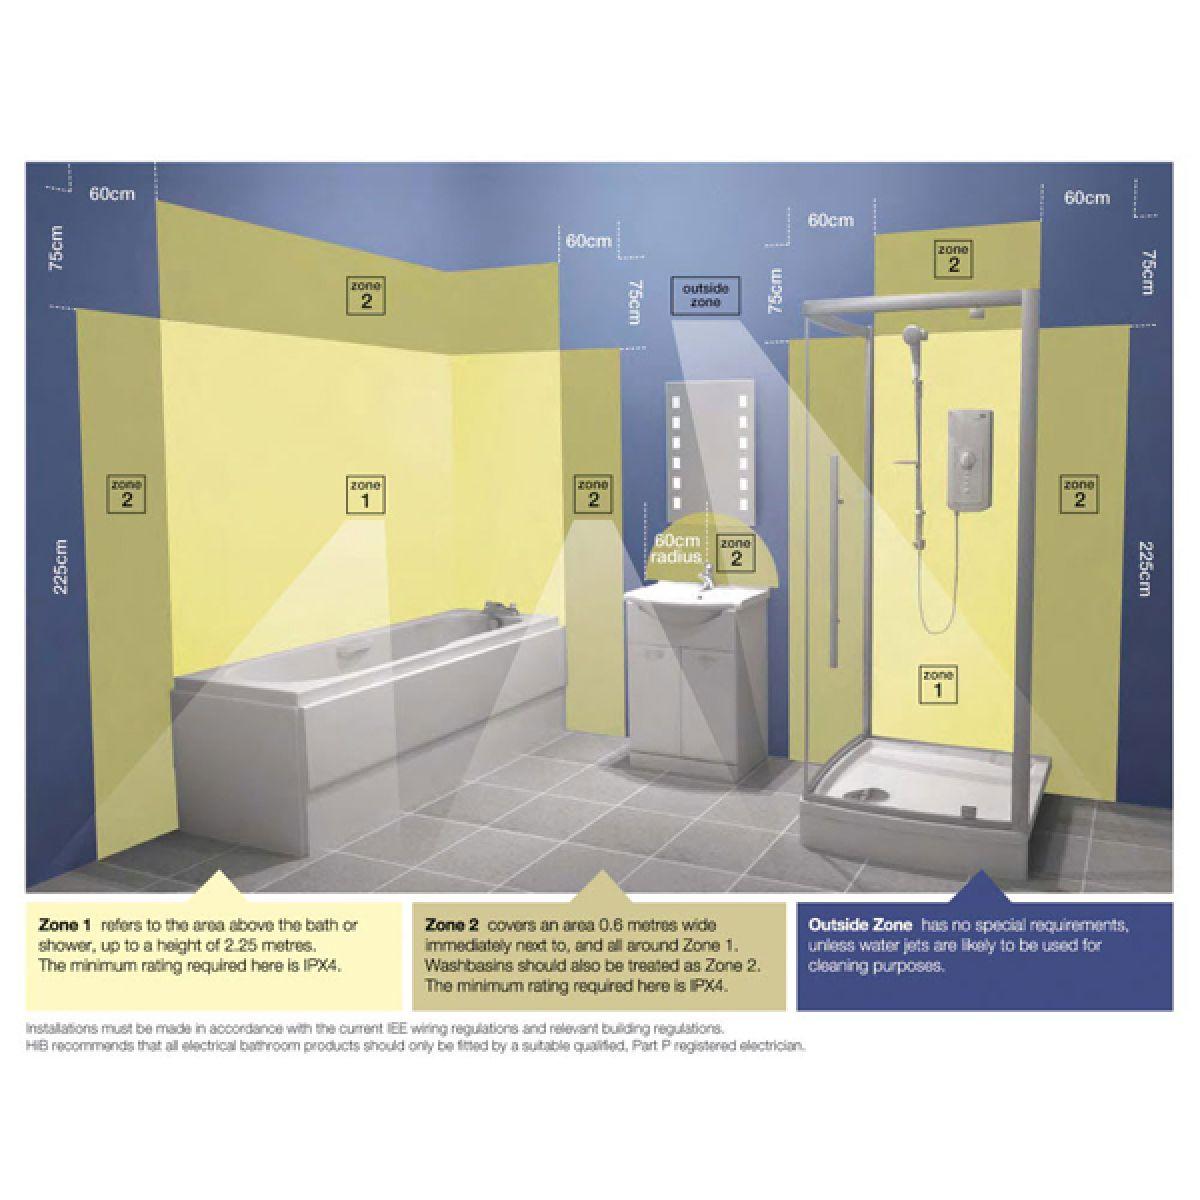 Home Furniture Diy Extractor Fans Humidity Sensor Time Hib Breeze Chrome Bathroom Extractor Fan Wall Mounted Bortexgroup Com